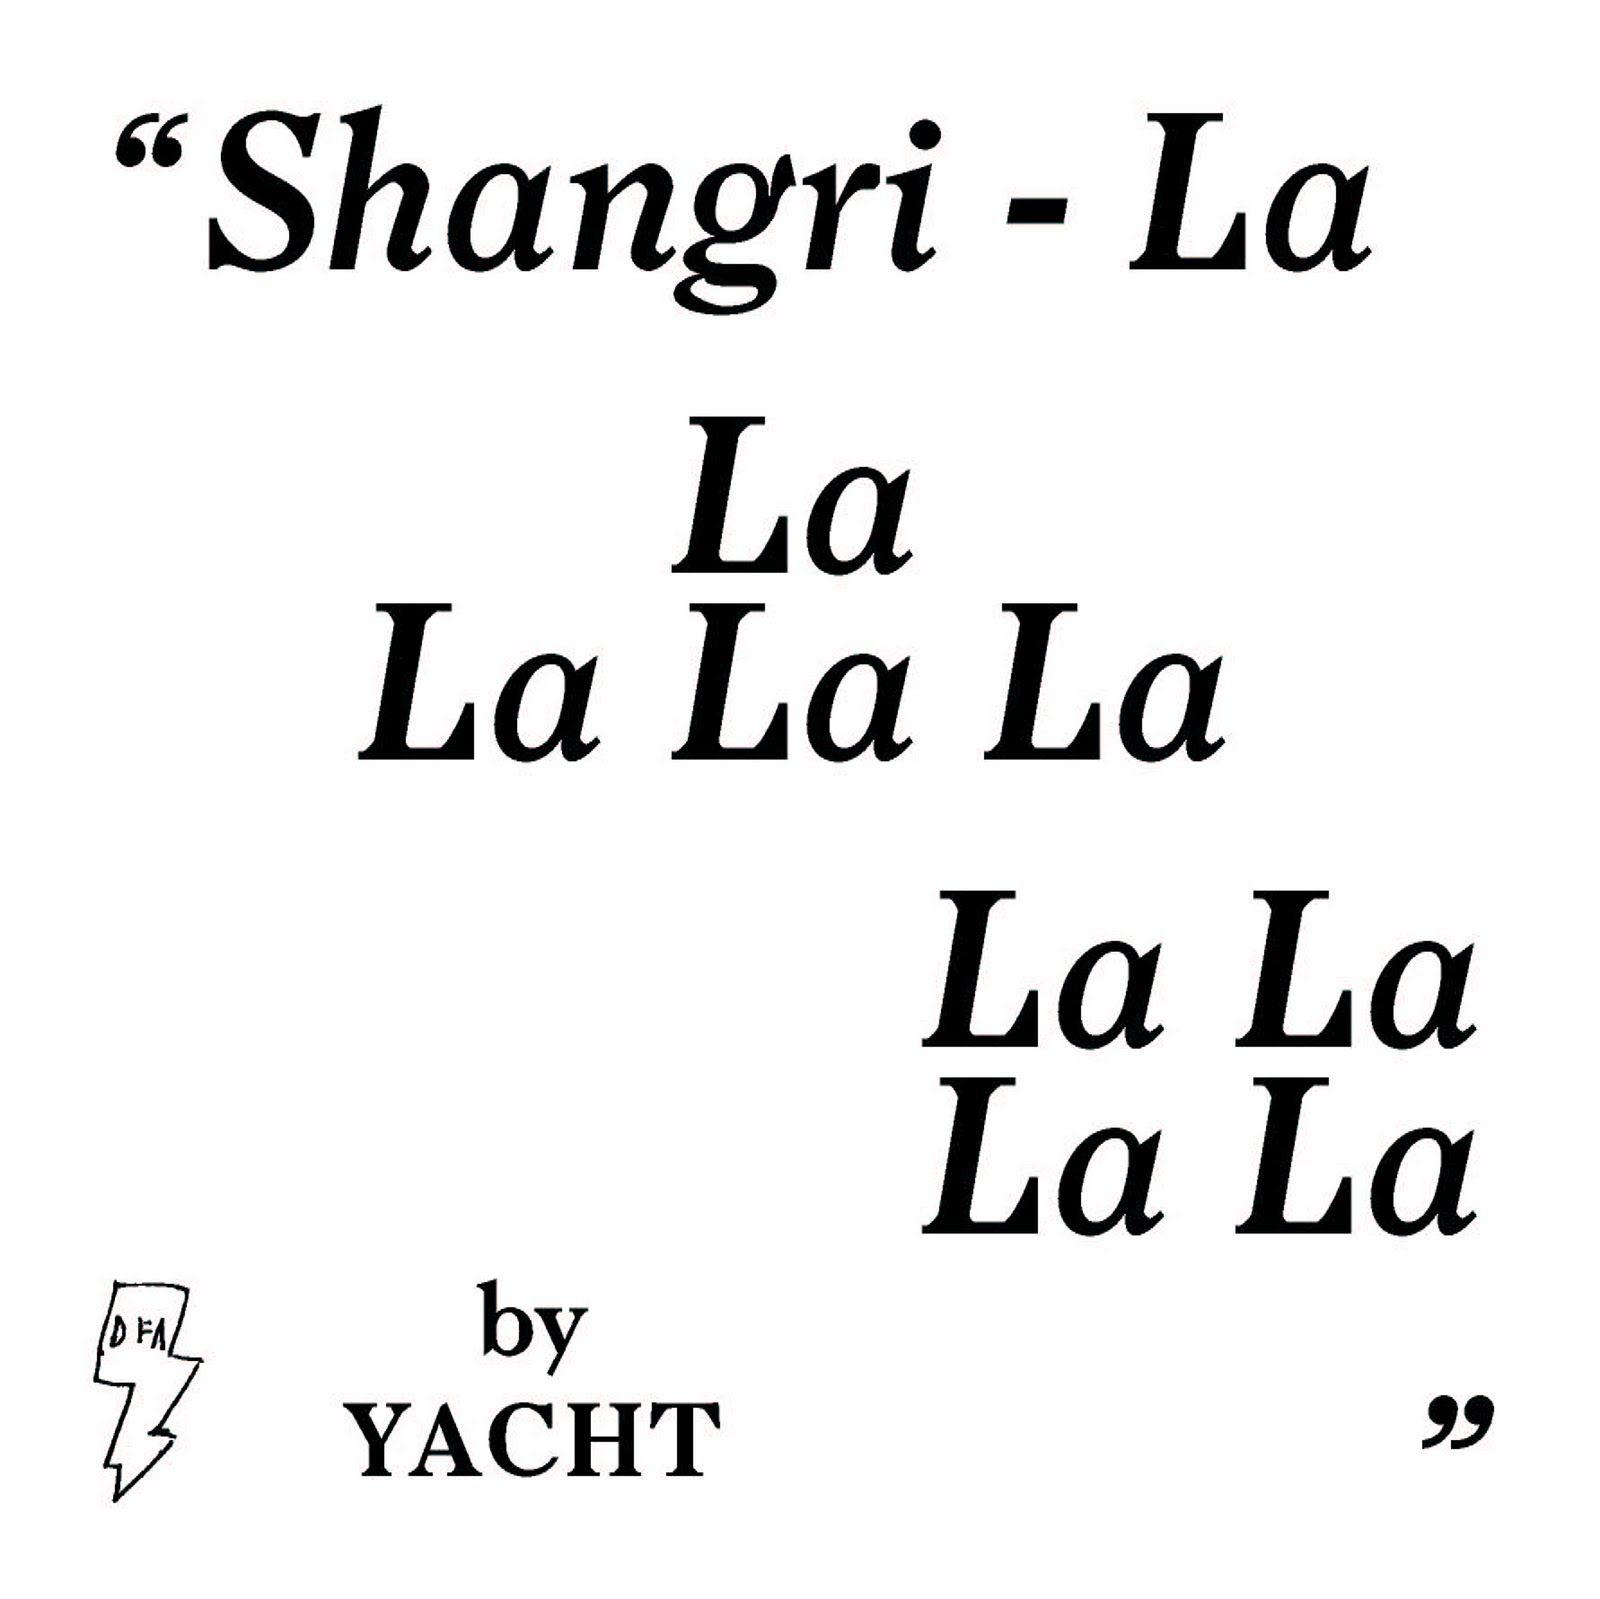 shangri lalala